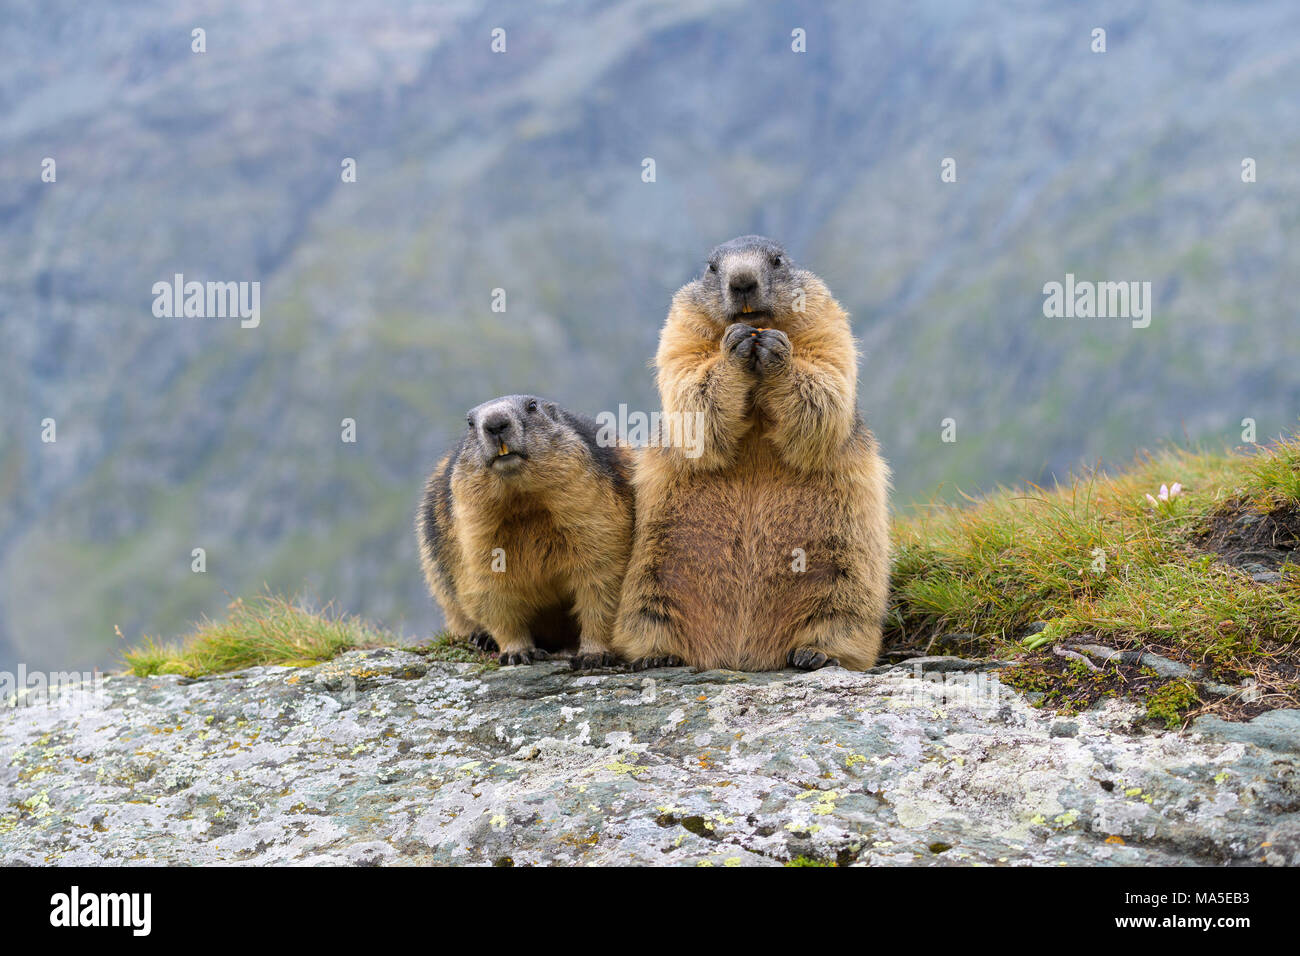 Alpine Marmot, Marmota marmota, two adults, Hohe Tauern National park, Austria - Stock Image